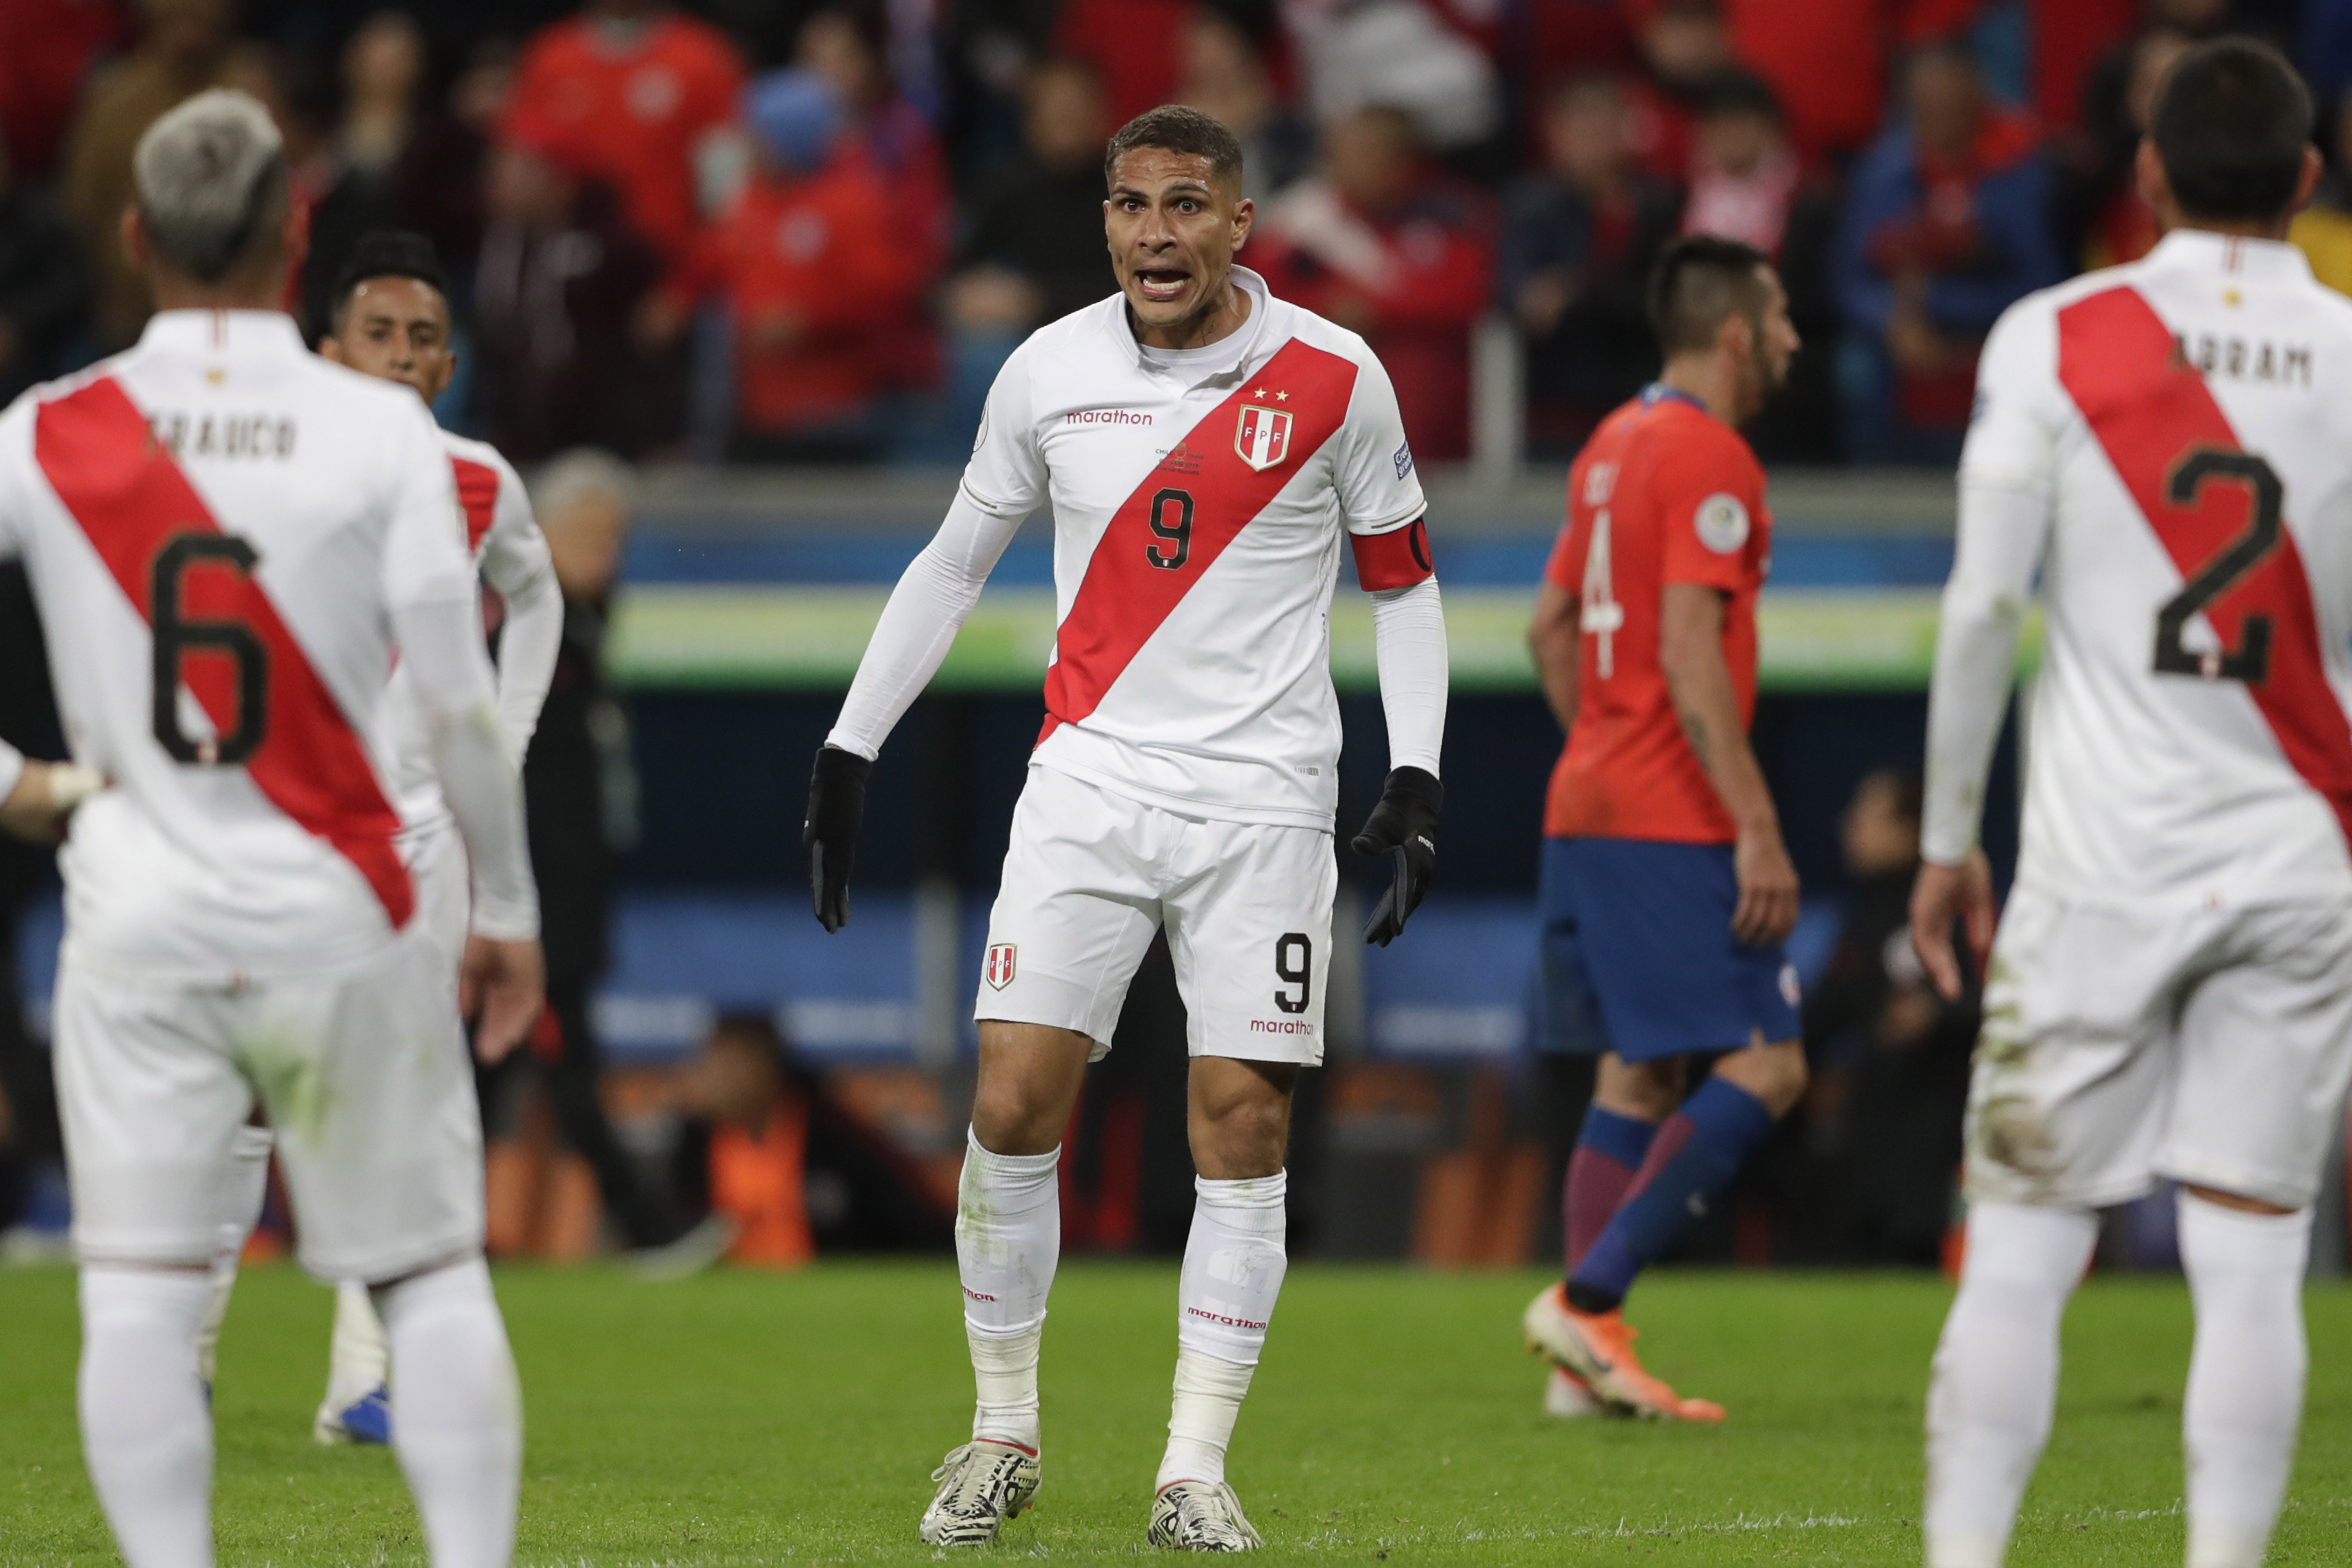 Brazil Vs Peru Free Live Stream 7 7 19 Watch Copa America 2019 Final Online Usa Tv Channel Time Odds Preview Nj Com